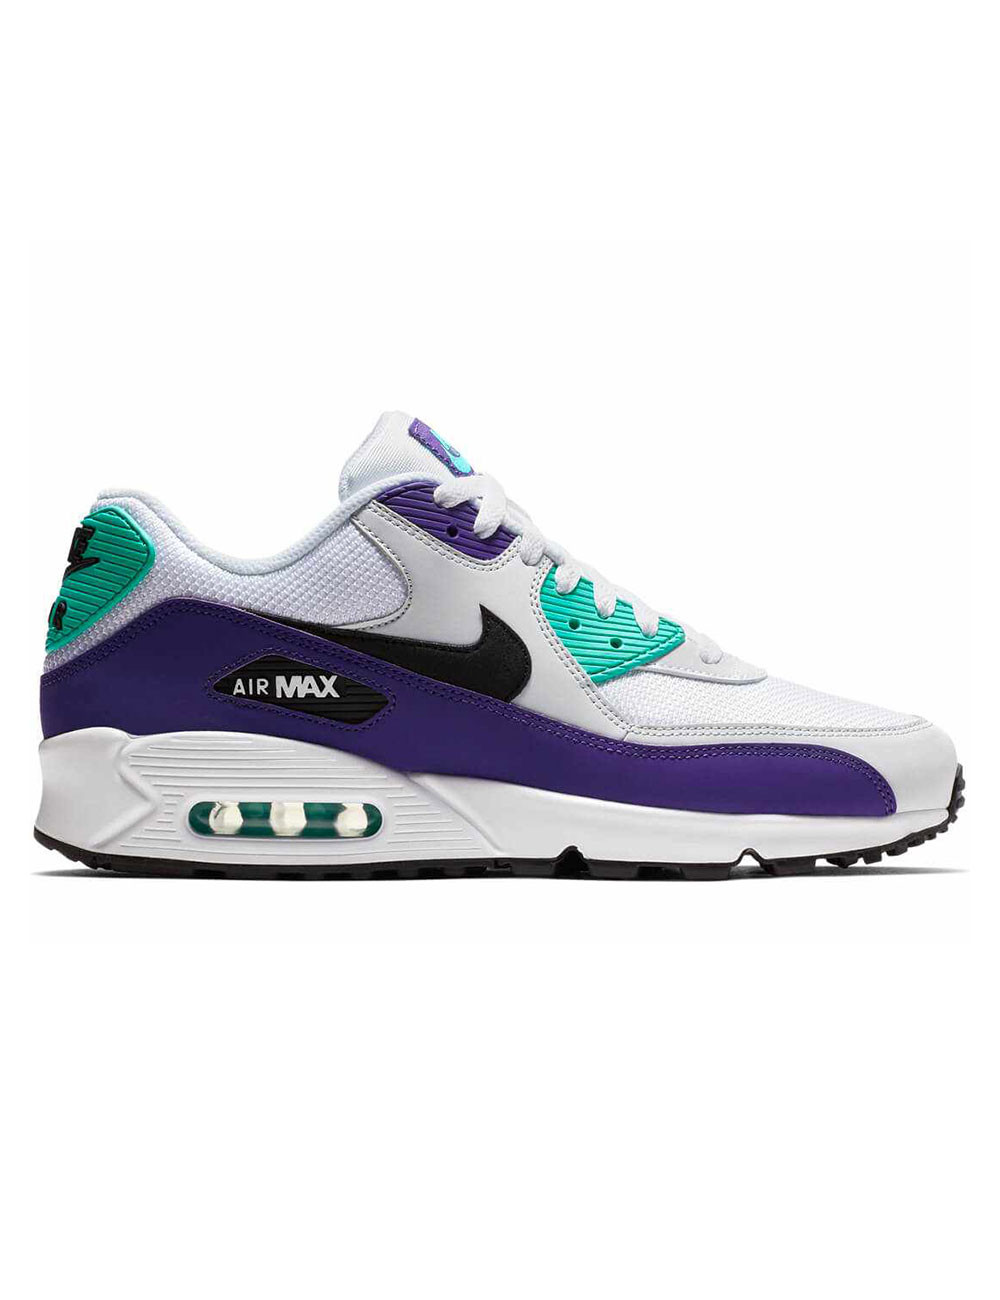 Nike sportswear Air max 90 essential - AJ1285-103 | Shapestore.it